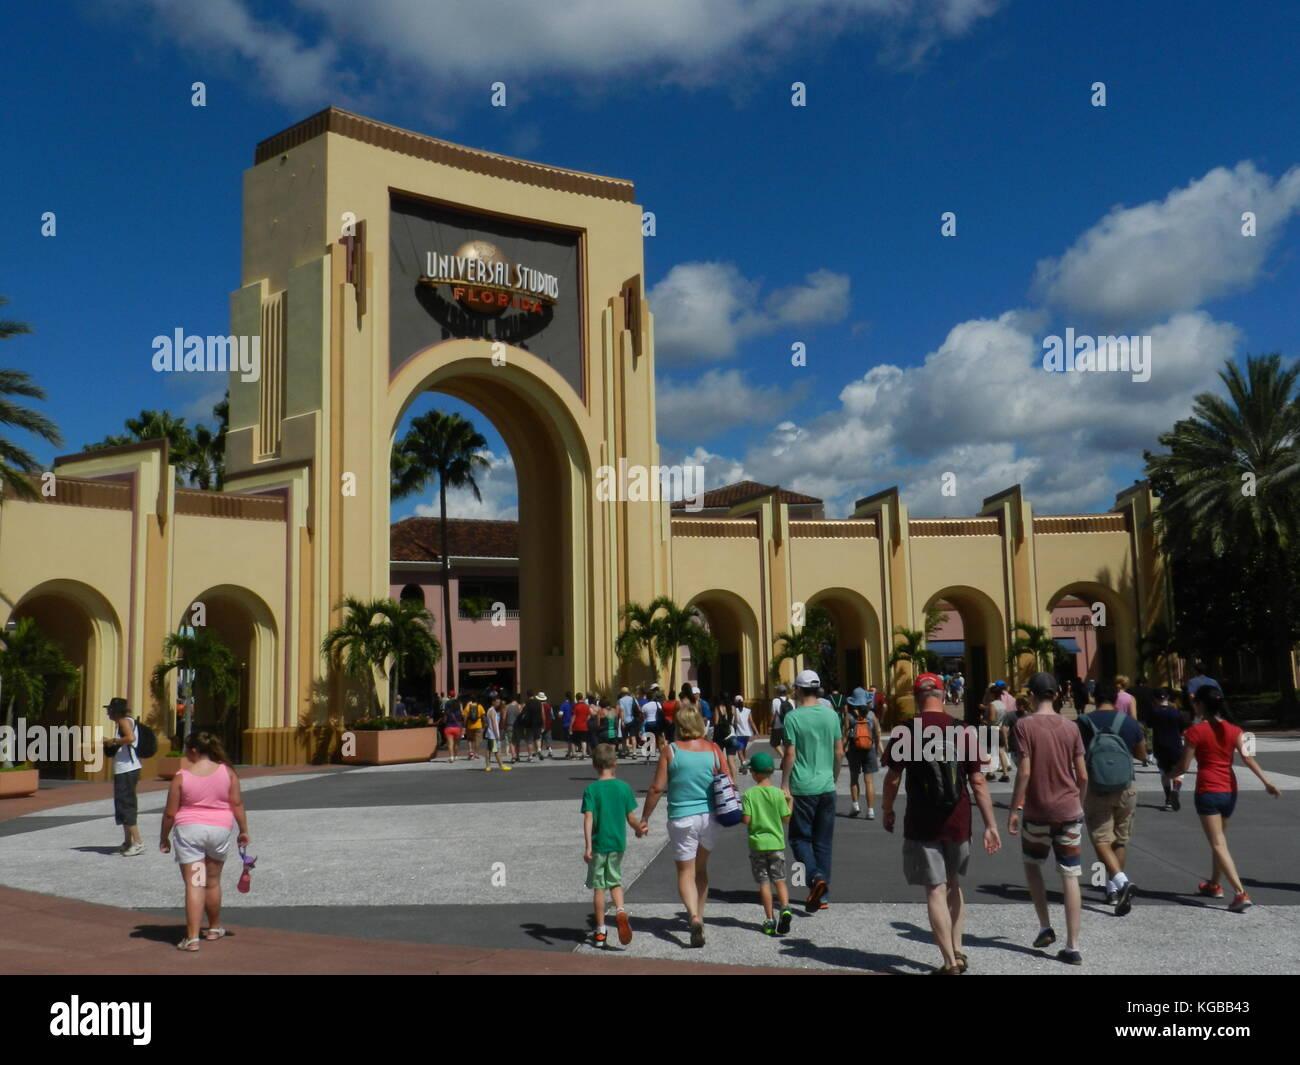 Universal Studios, theme park entrance, Orlando,Florida - Stock Image